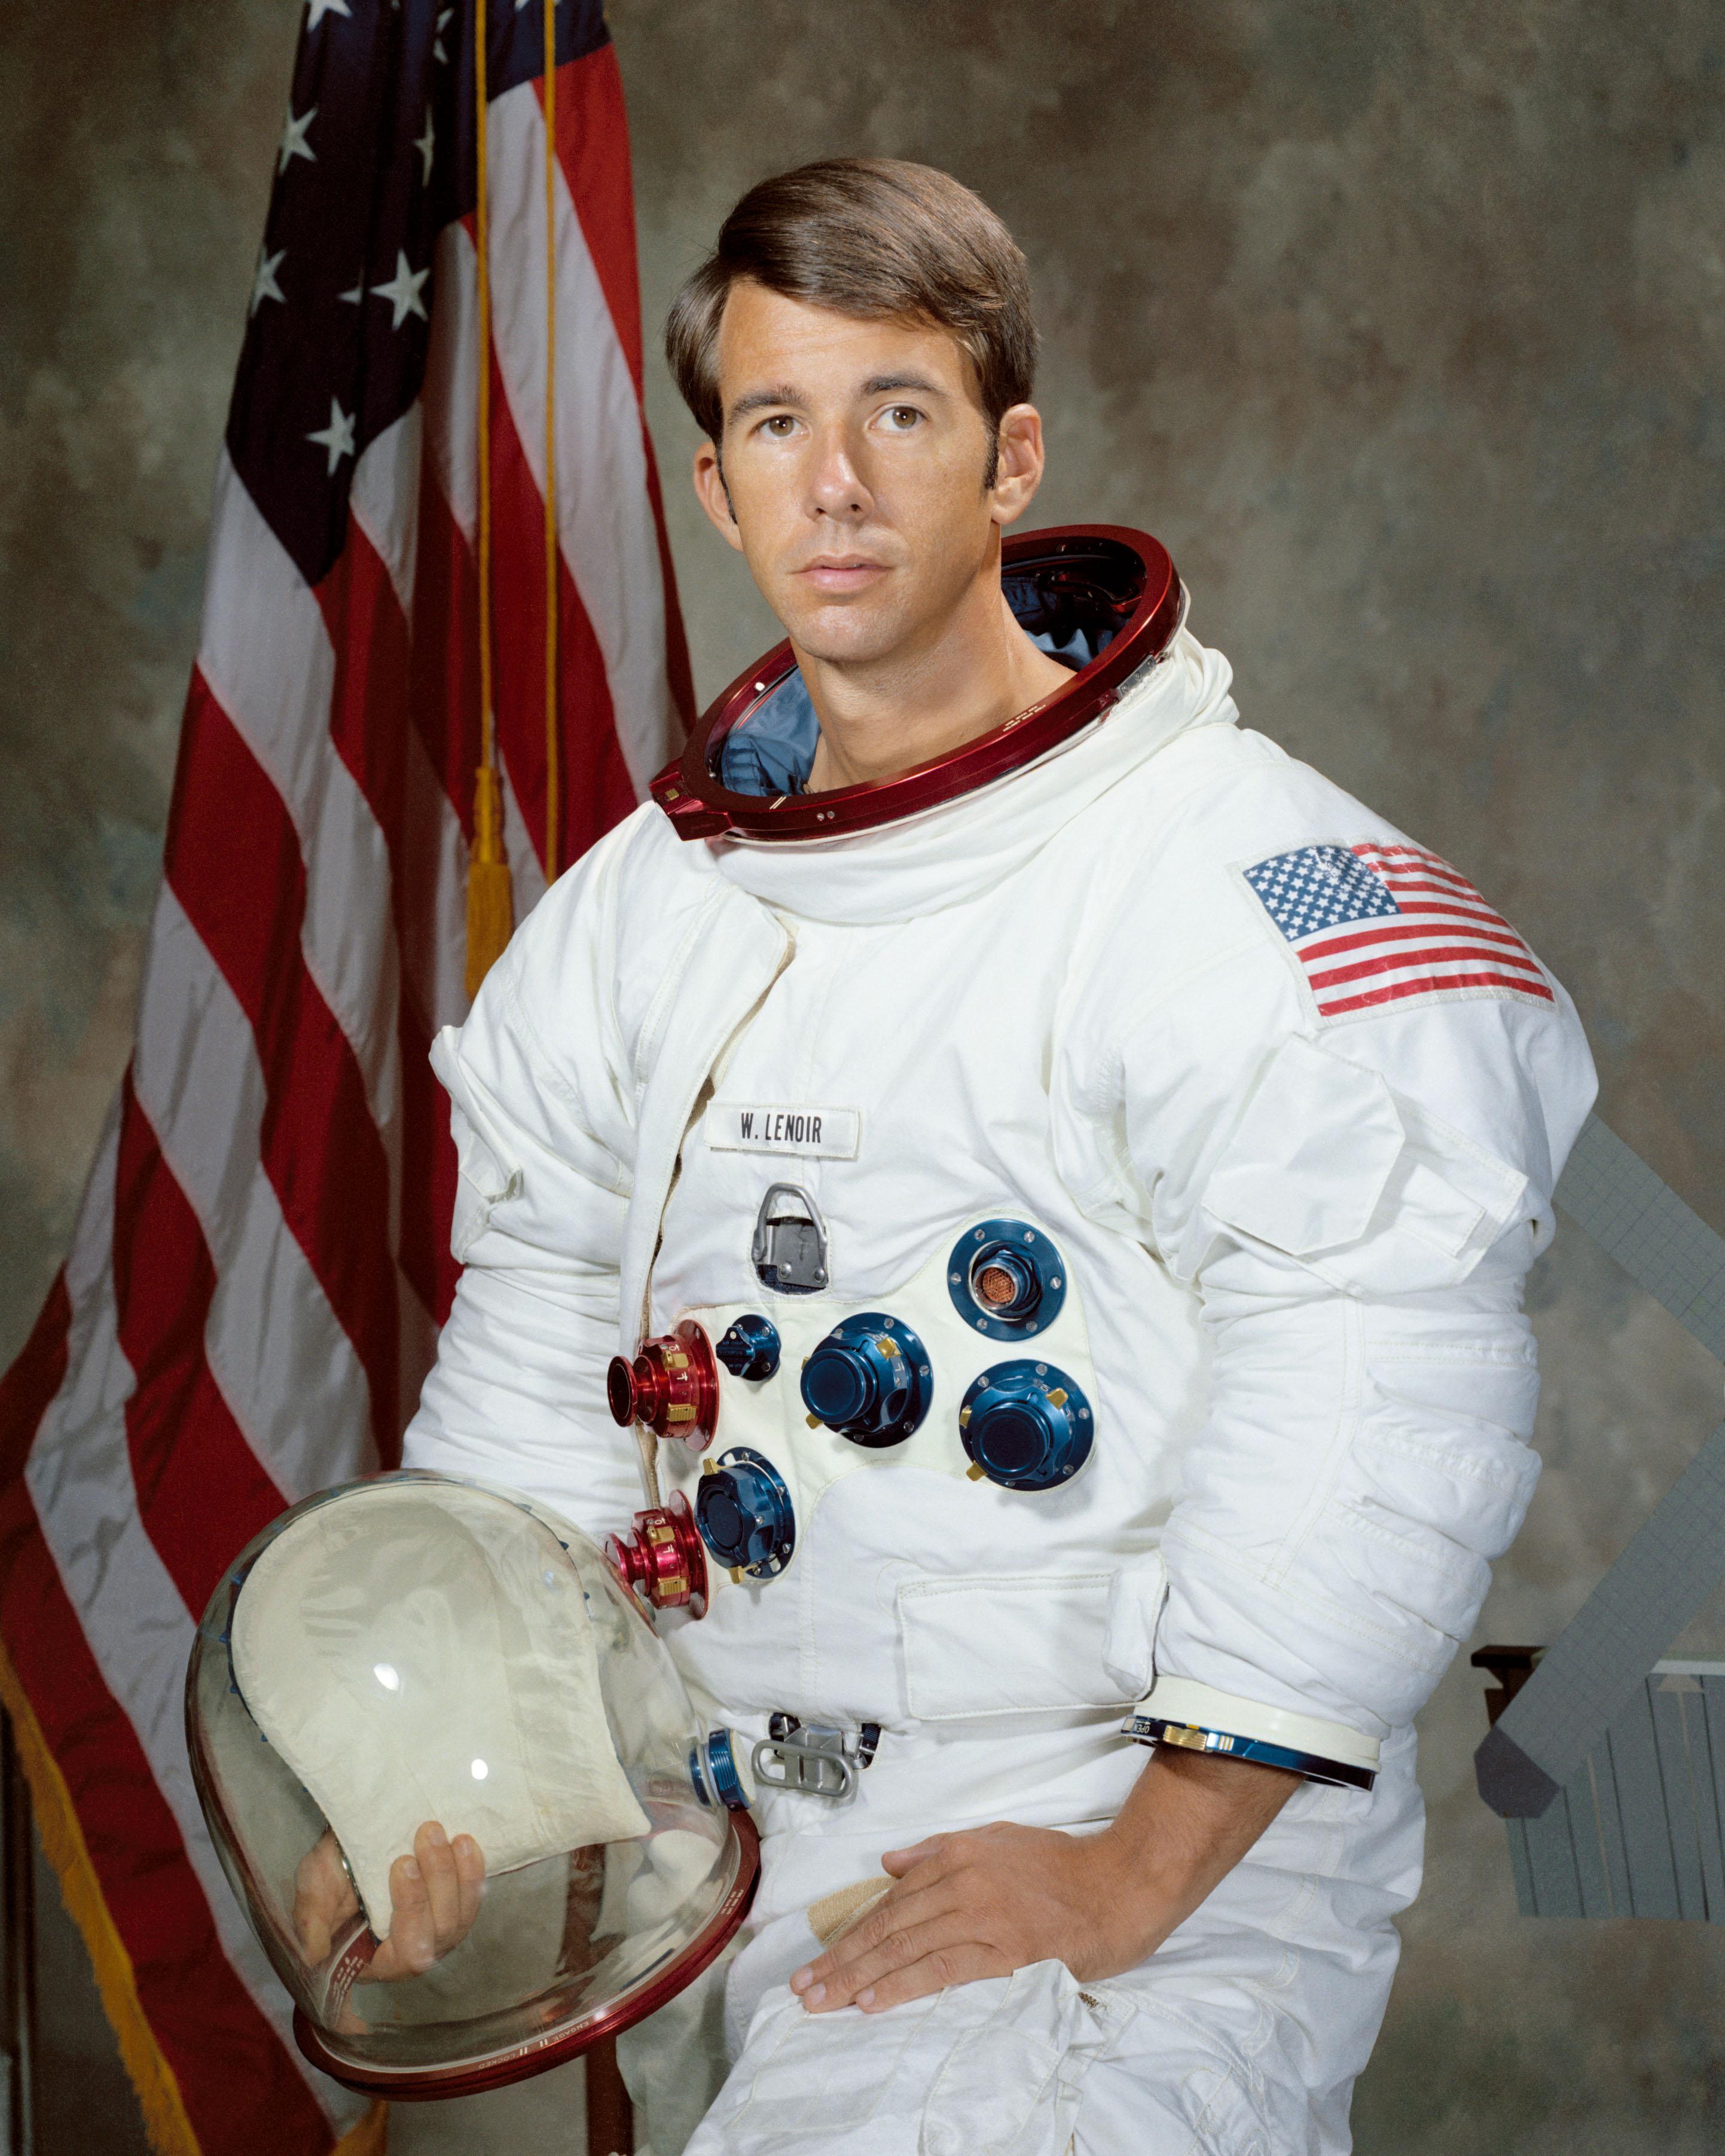 Special Citation - The Astronauts